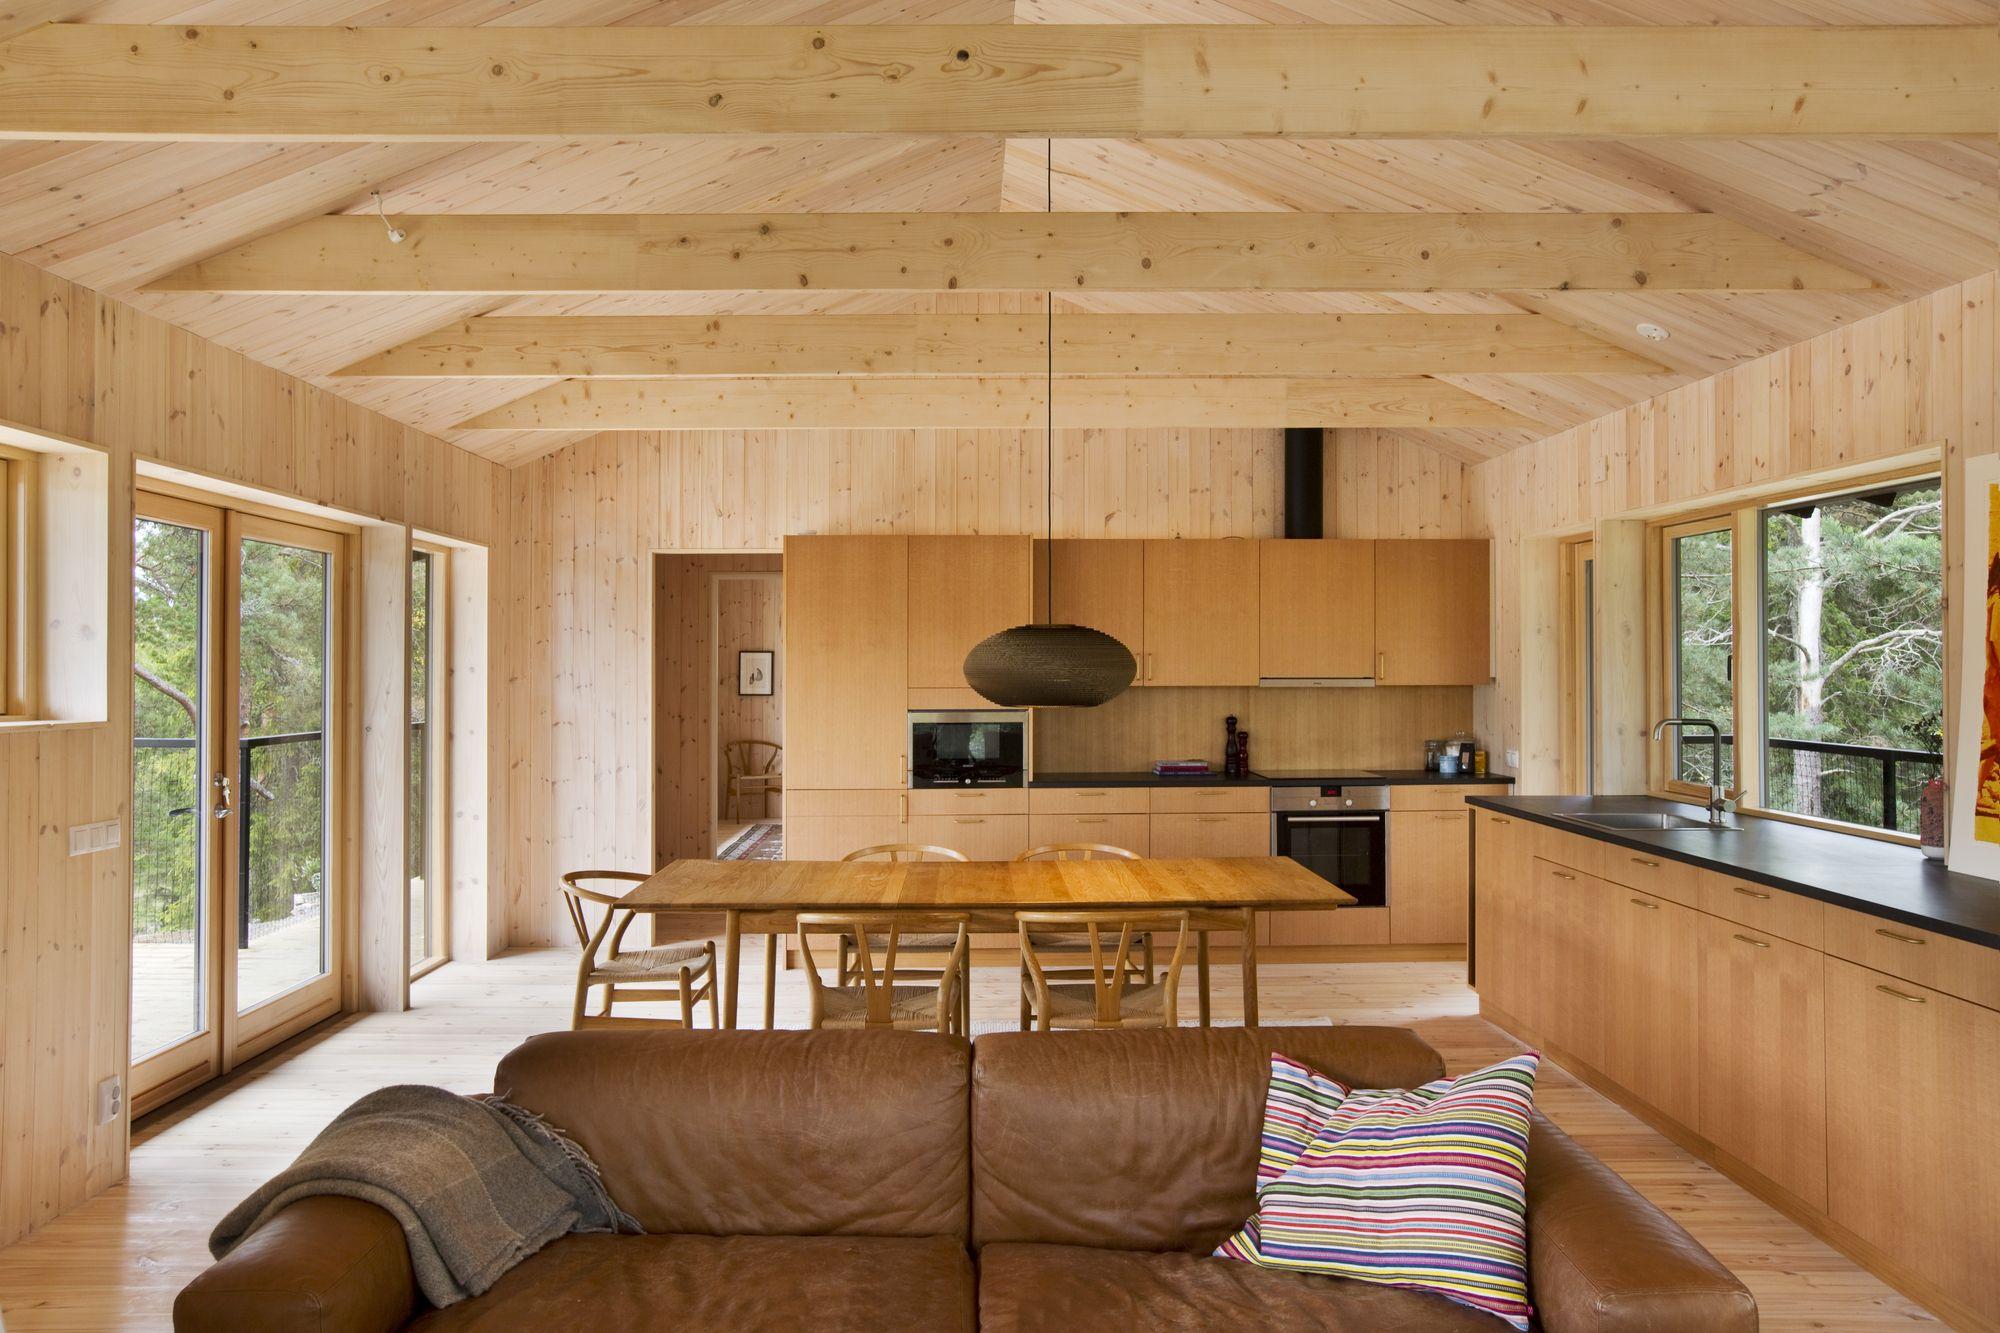 Interiorres de casas de madera dise o de la peque a for Casas de madera pequenas